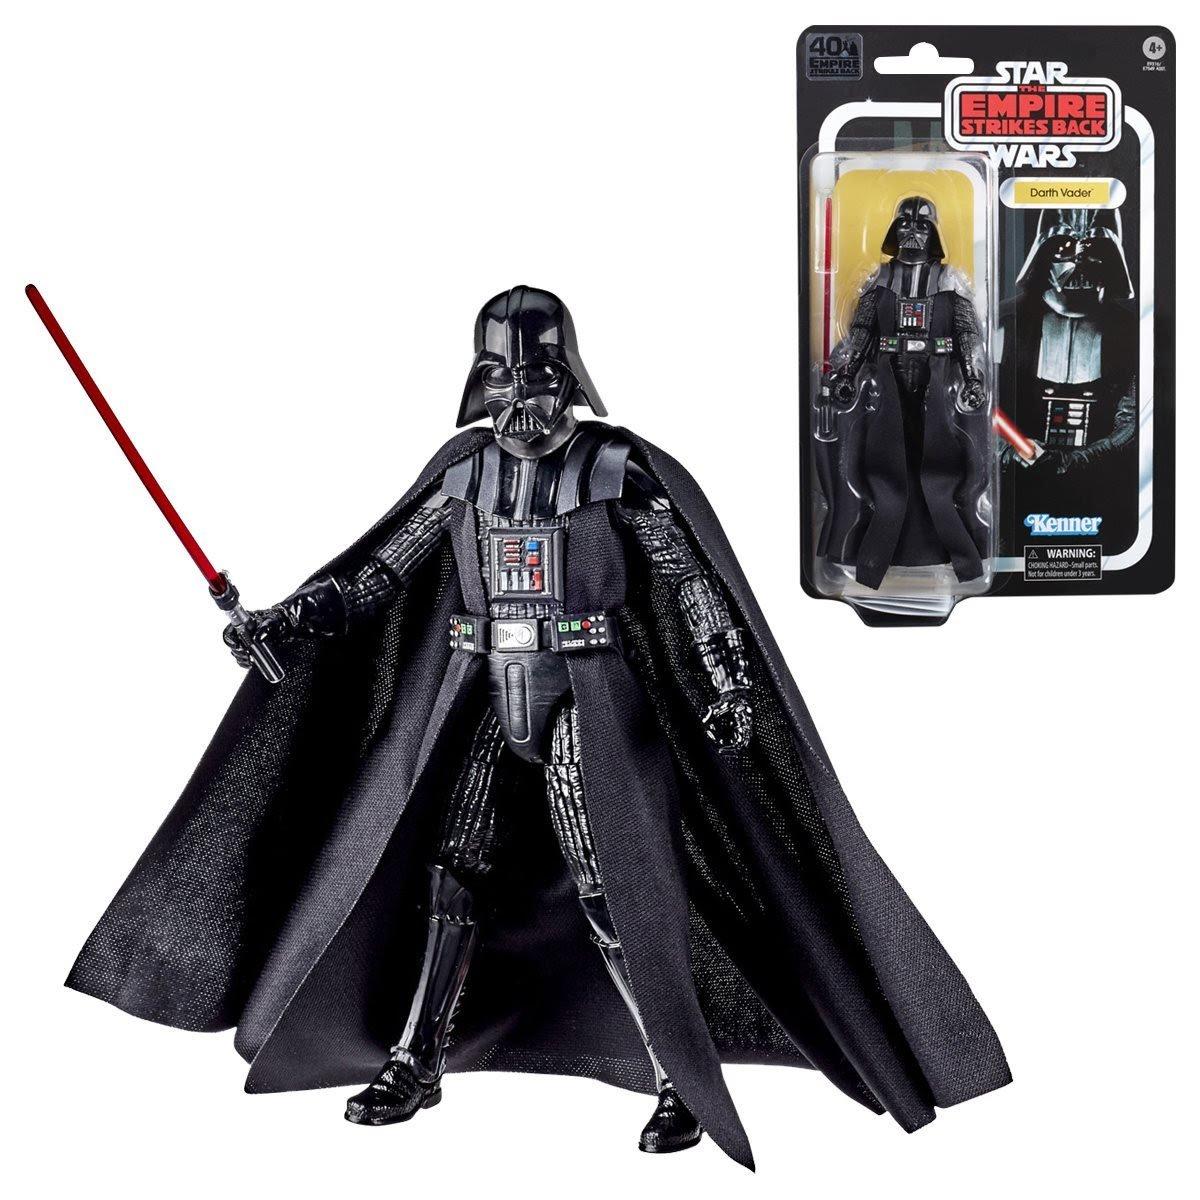 Star Wars Darth Vader 40th Anniversary Figure